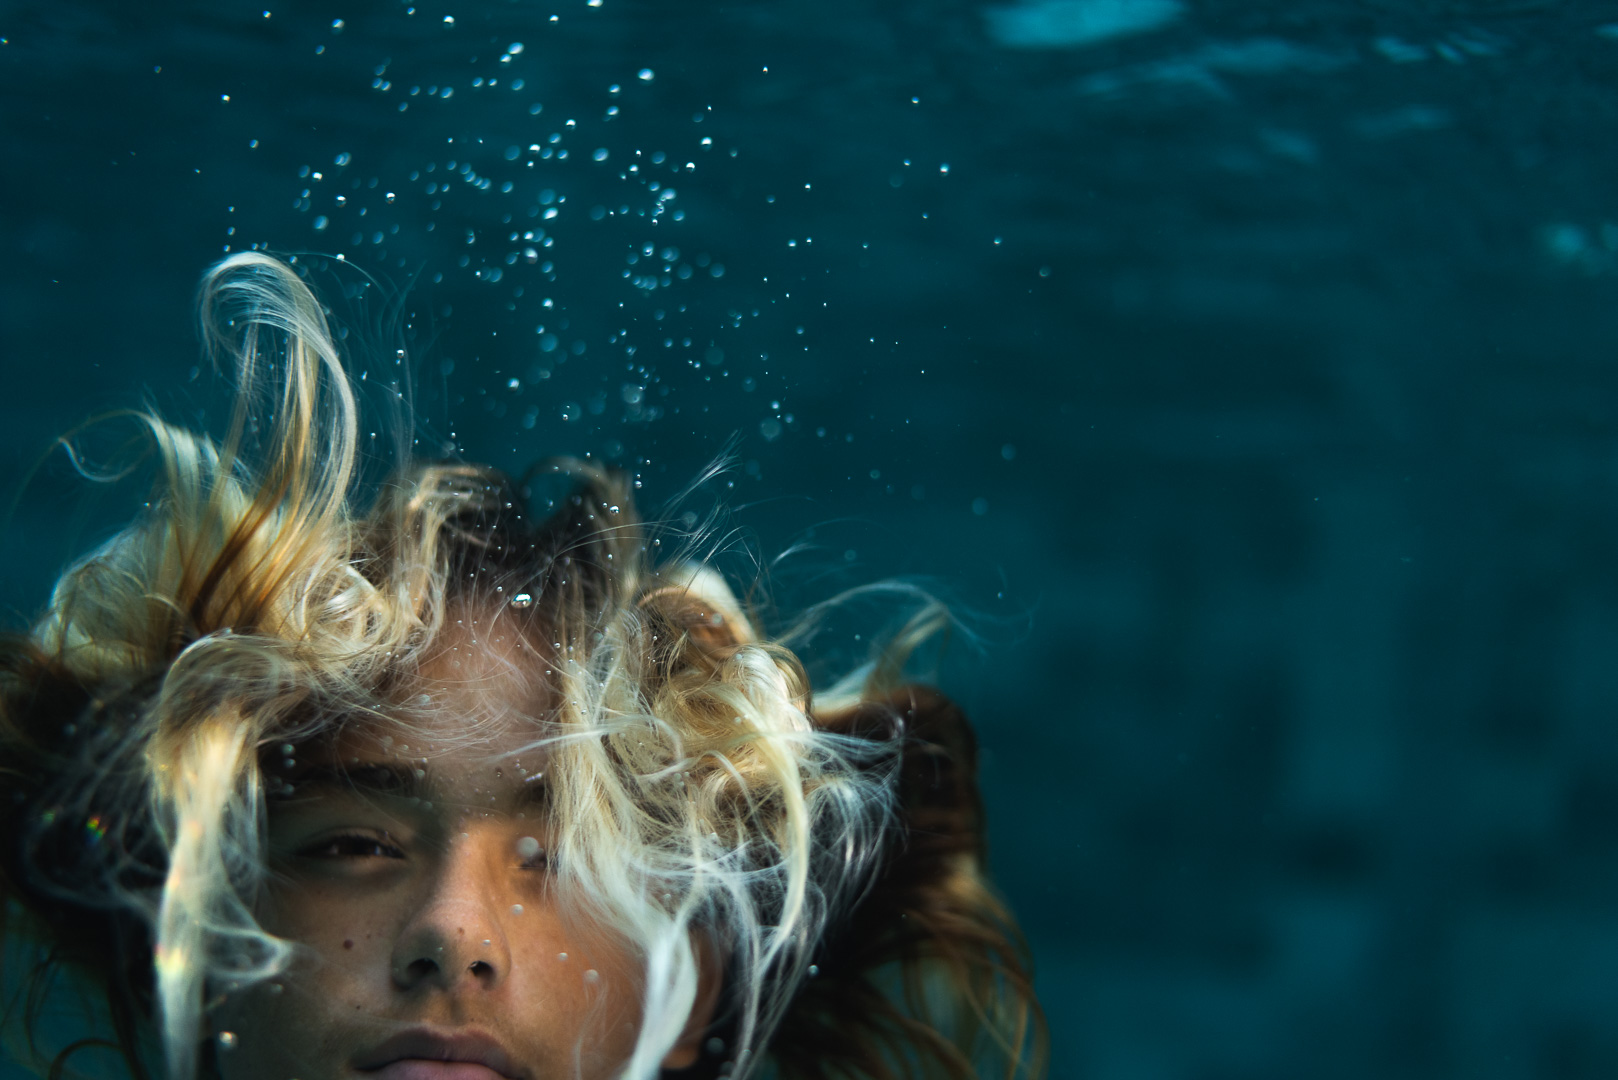 Surf Ocean & Lifestyle Photography workshop in Bali - underwater portraits.jpg